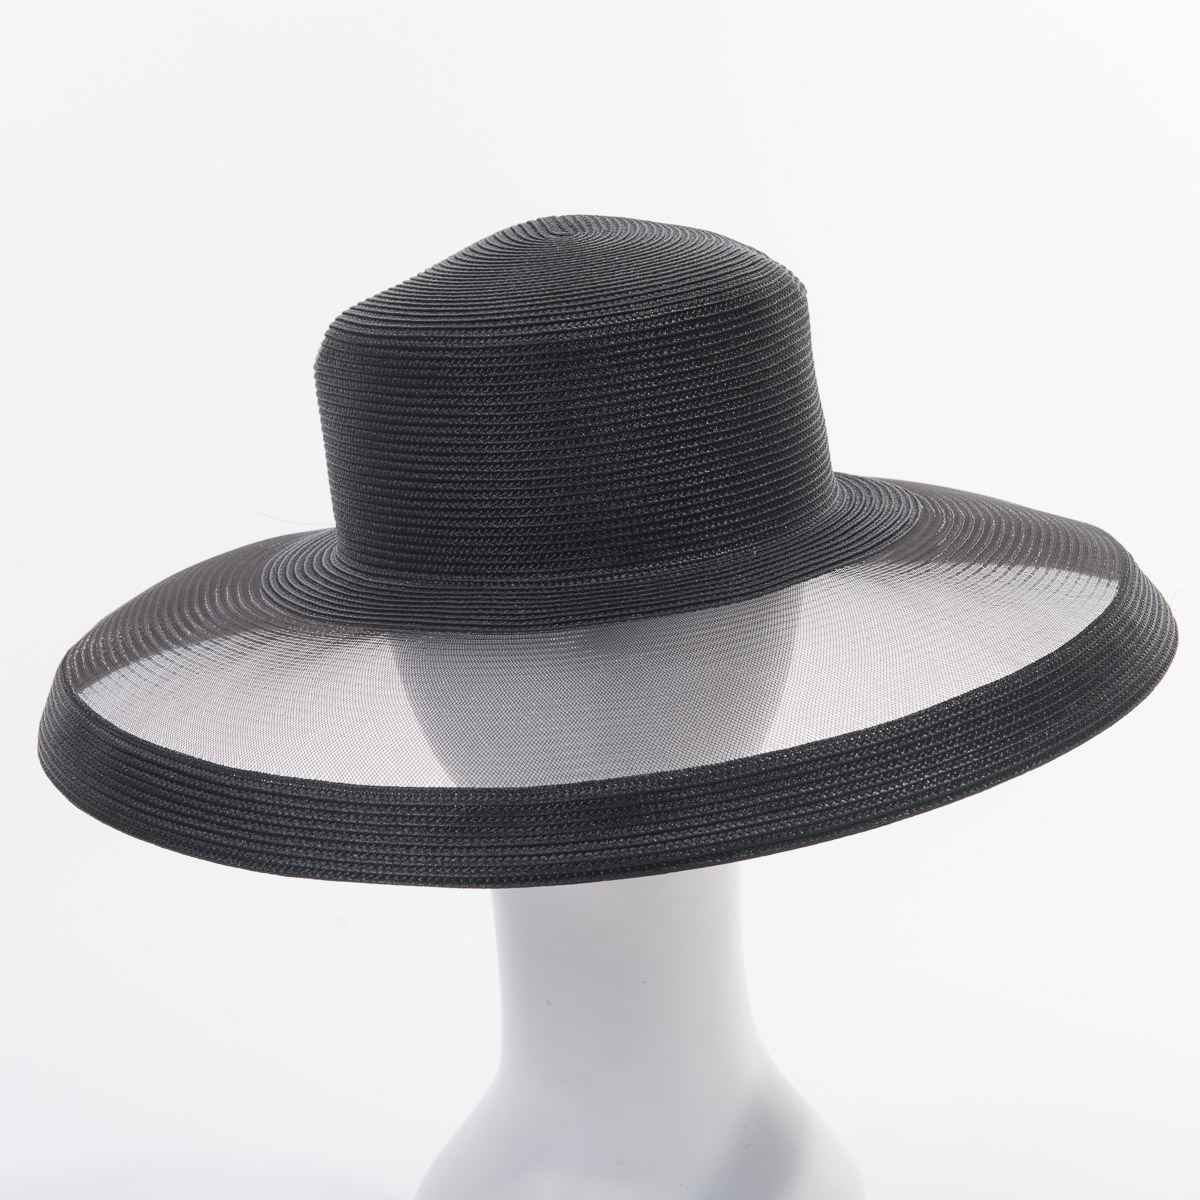 2f691c296 Matt Poly Crinoline Wide Brim Plain Hats-CE8876R- Sun Yorkos | Zoria